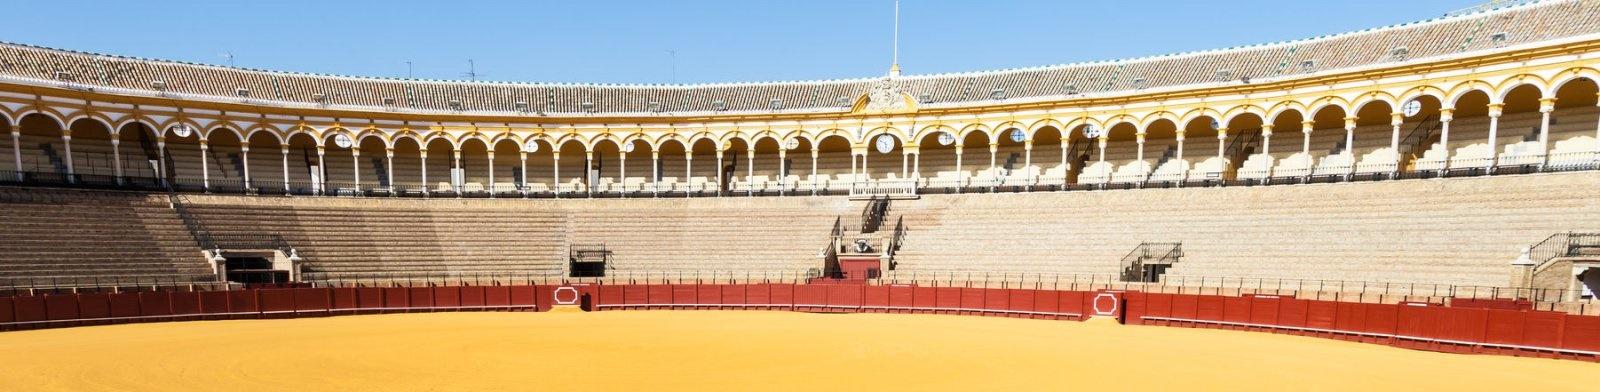 Andalucia, Bullring